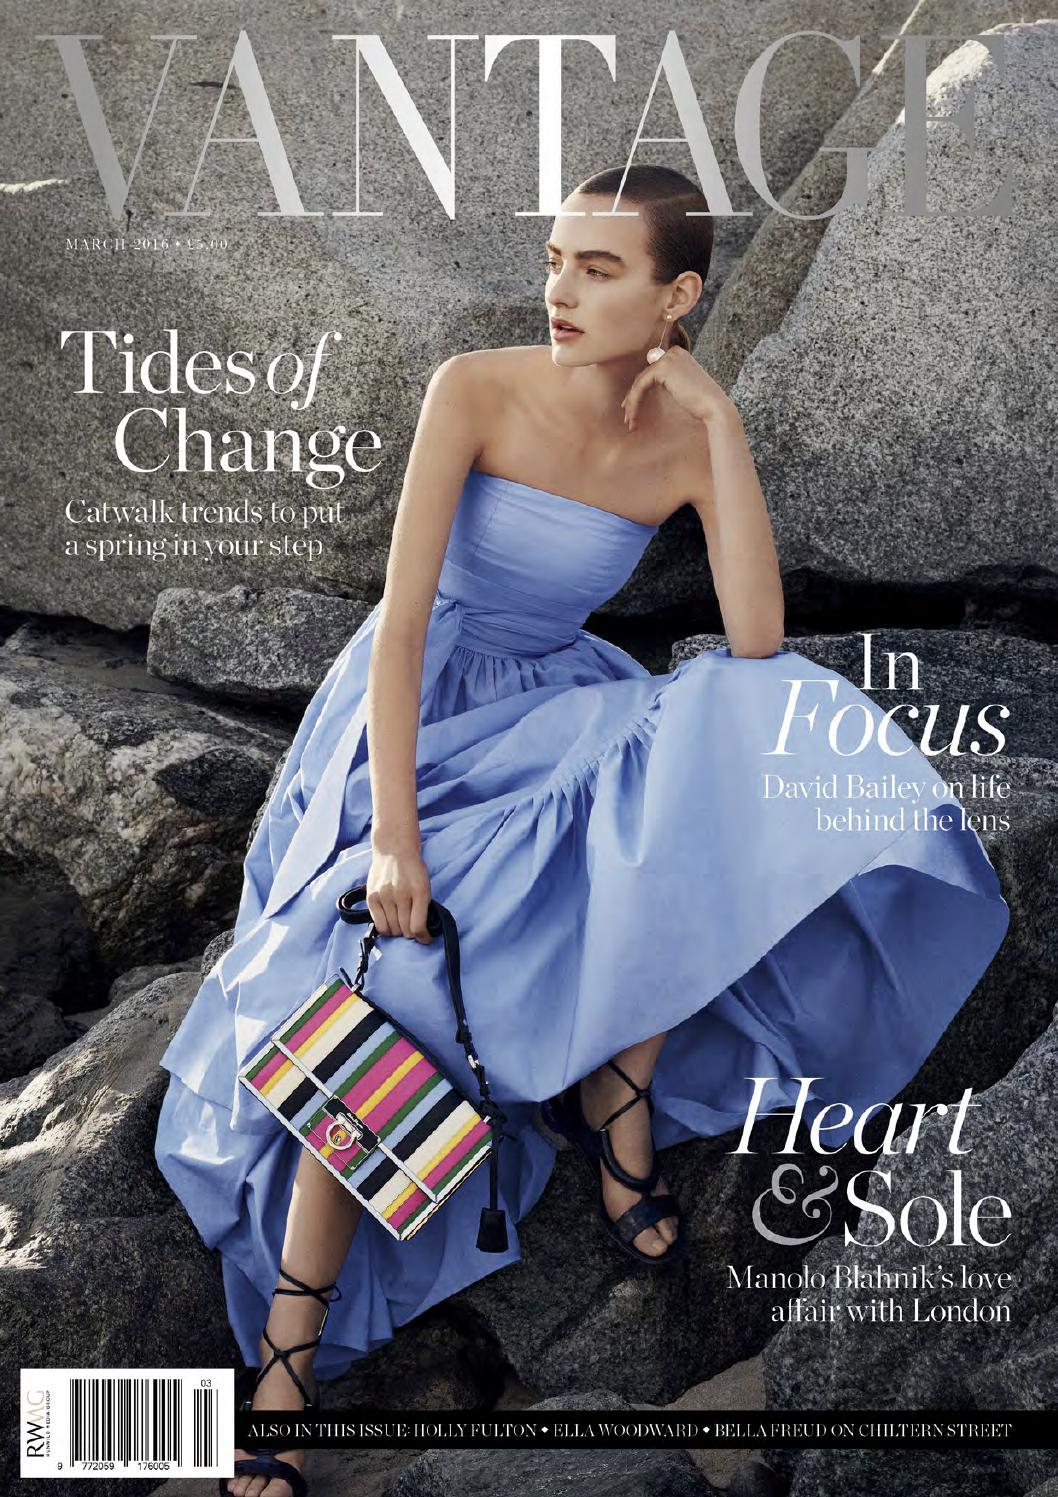 539506cfa3bcc Vantage Magazine March 2016 by Runwild Media Group - issuu